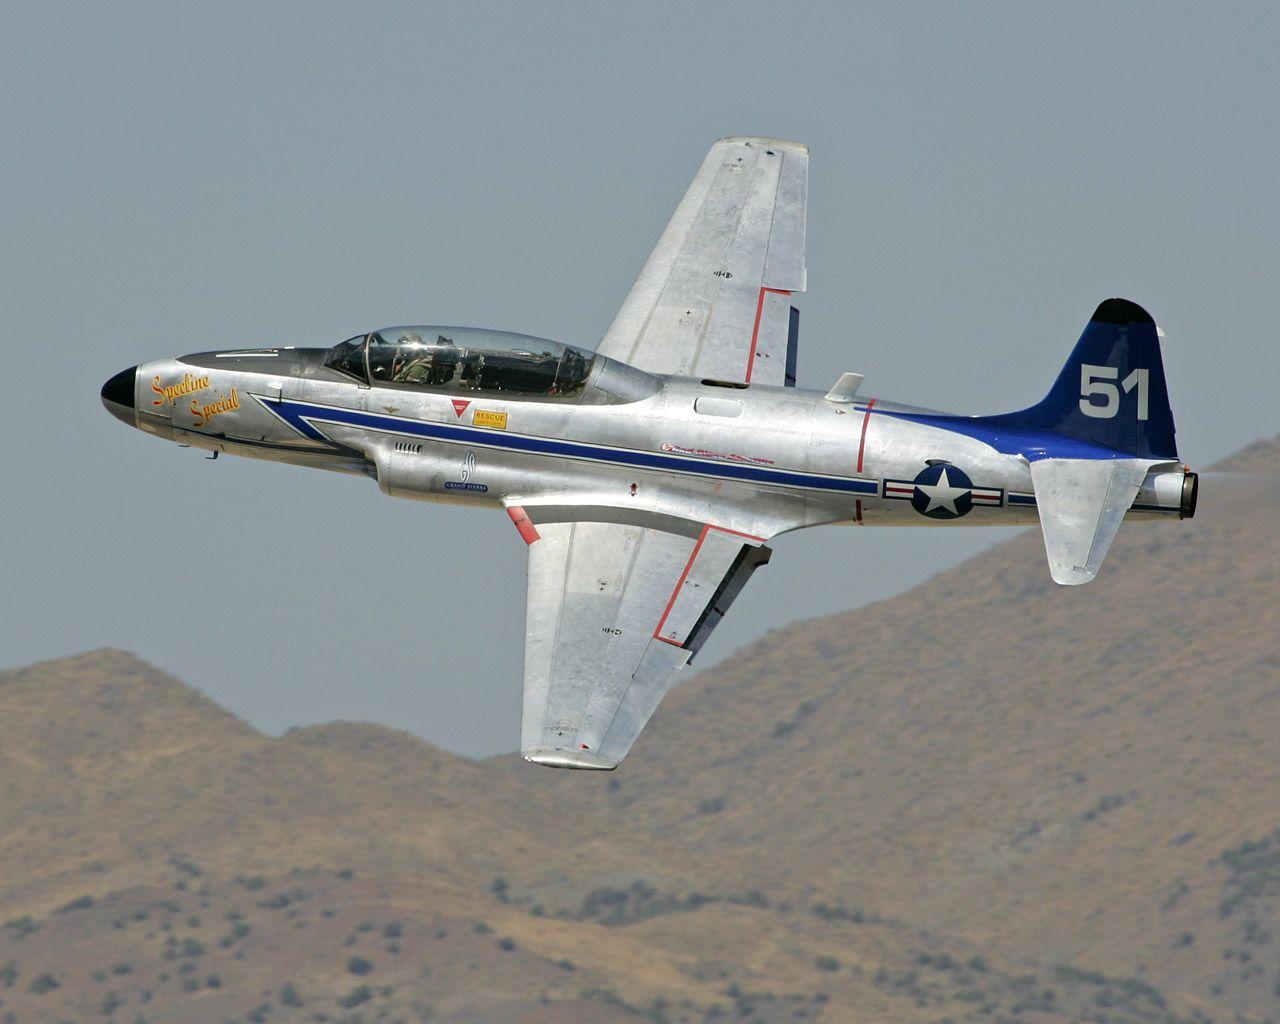 Speeline Special T33 Jet Class Air race, Aviation